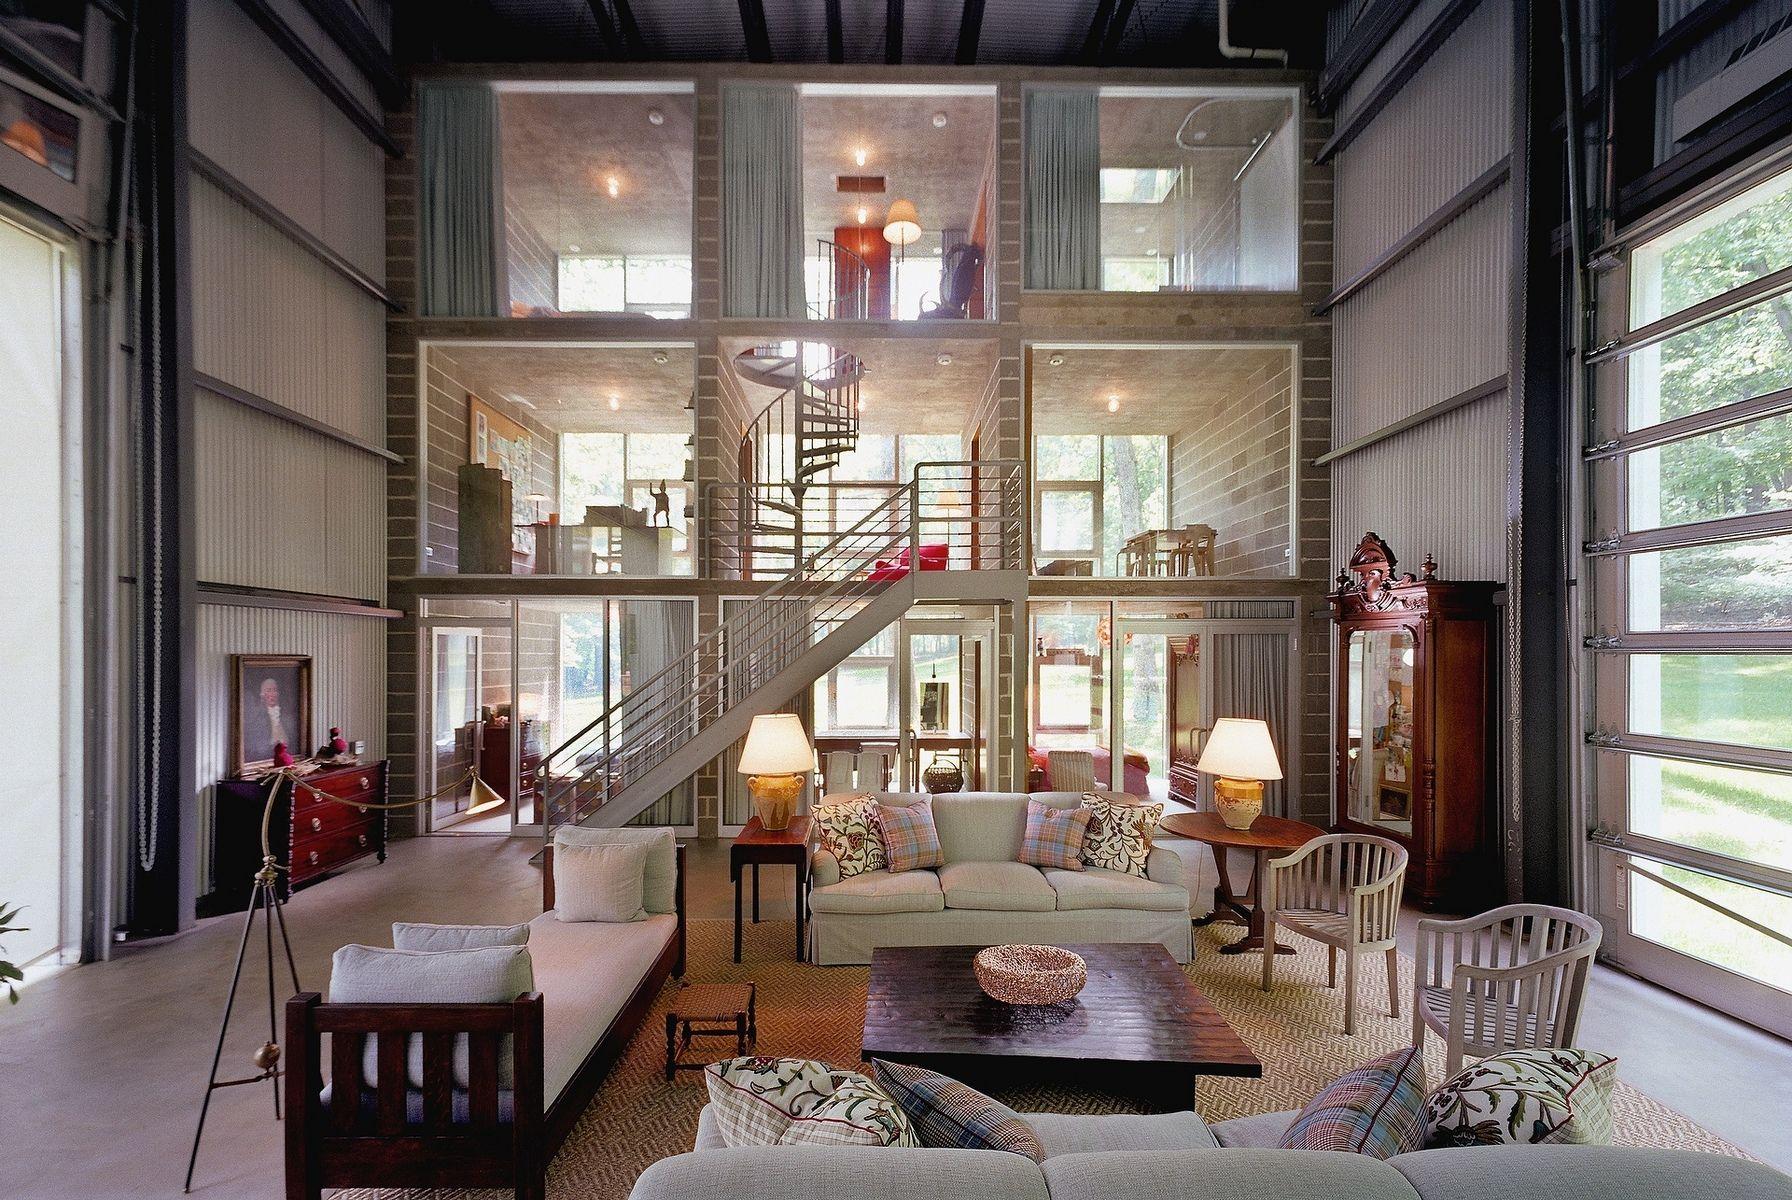 container home designers%0A A completely bizarre home  u   e Adam Kalkin  Bunny Lane House